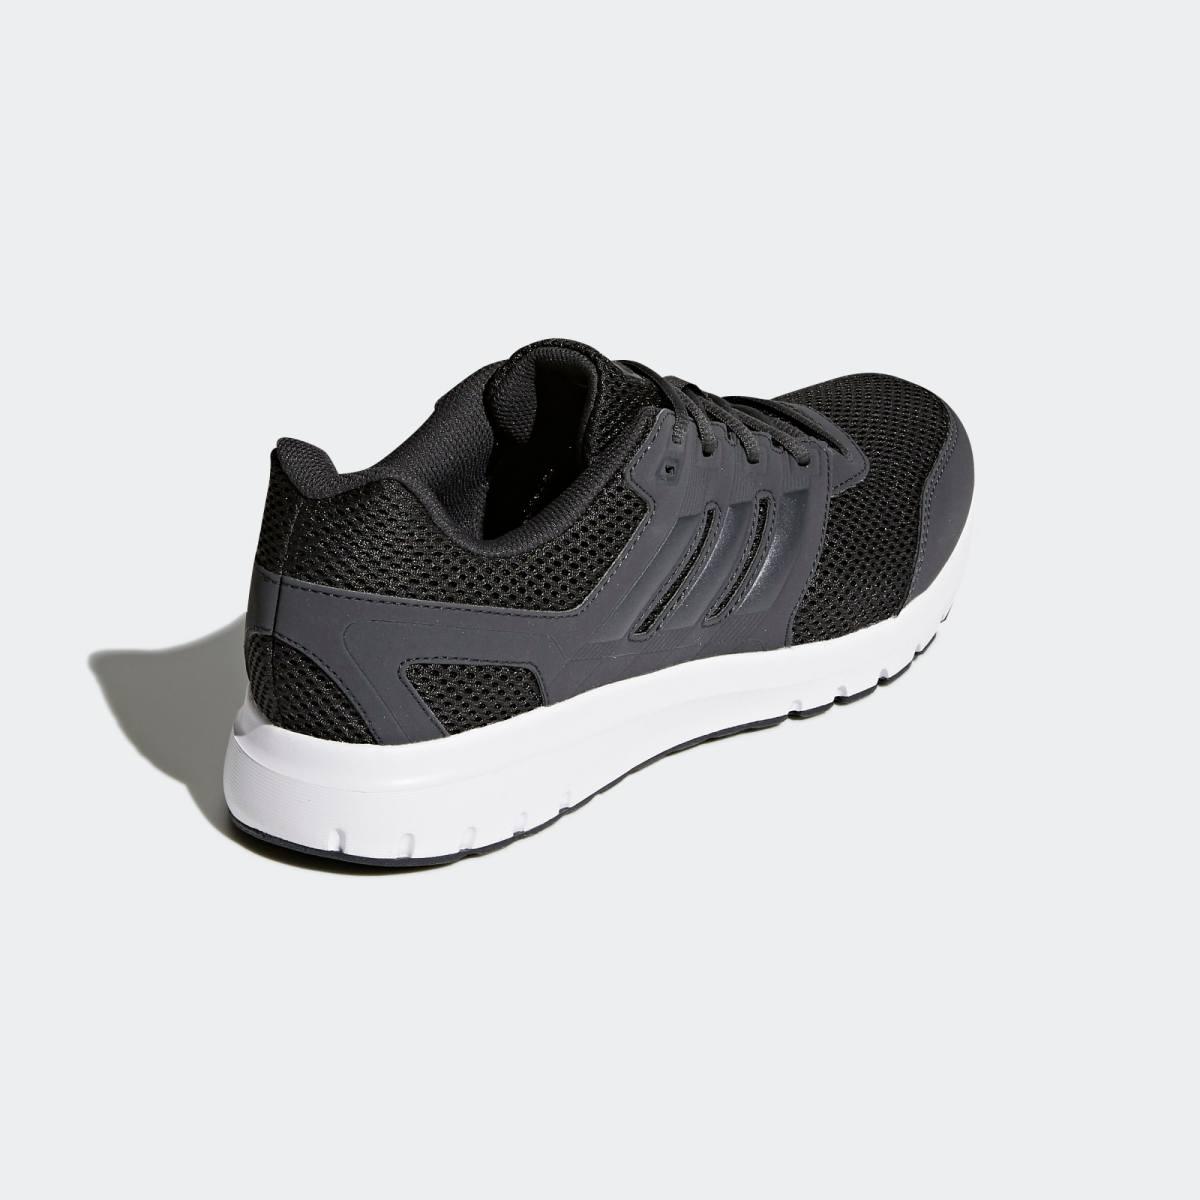 Chaussure_Duramo_Lite_2.0_Gris_CG4044_05_standard